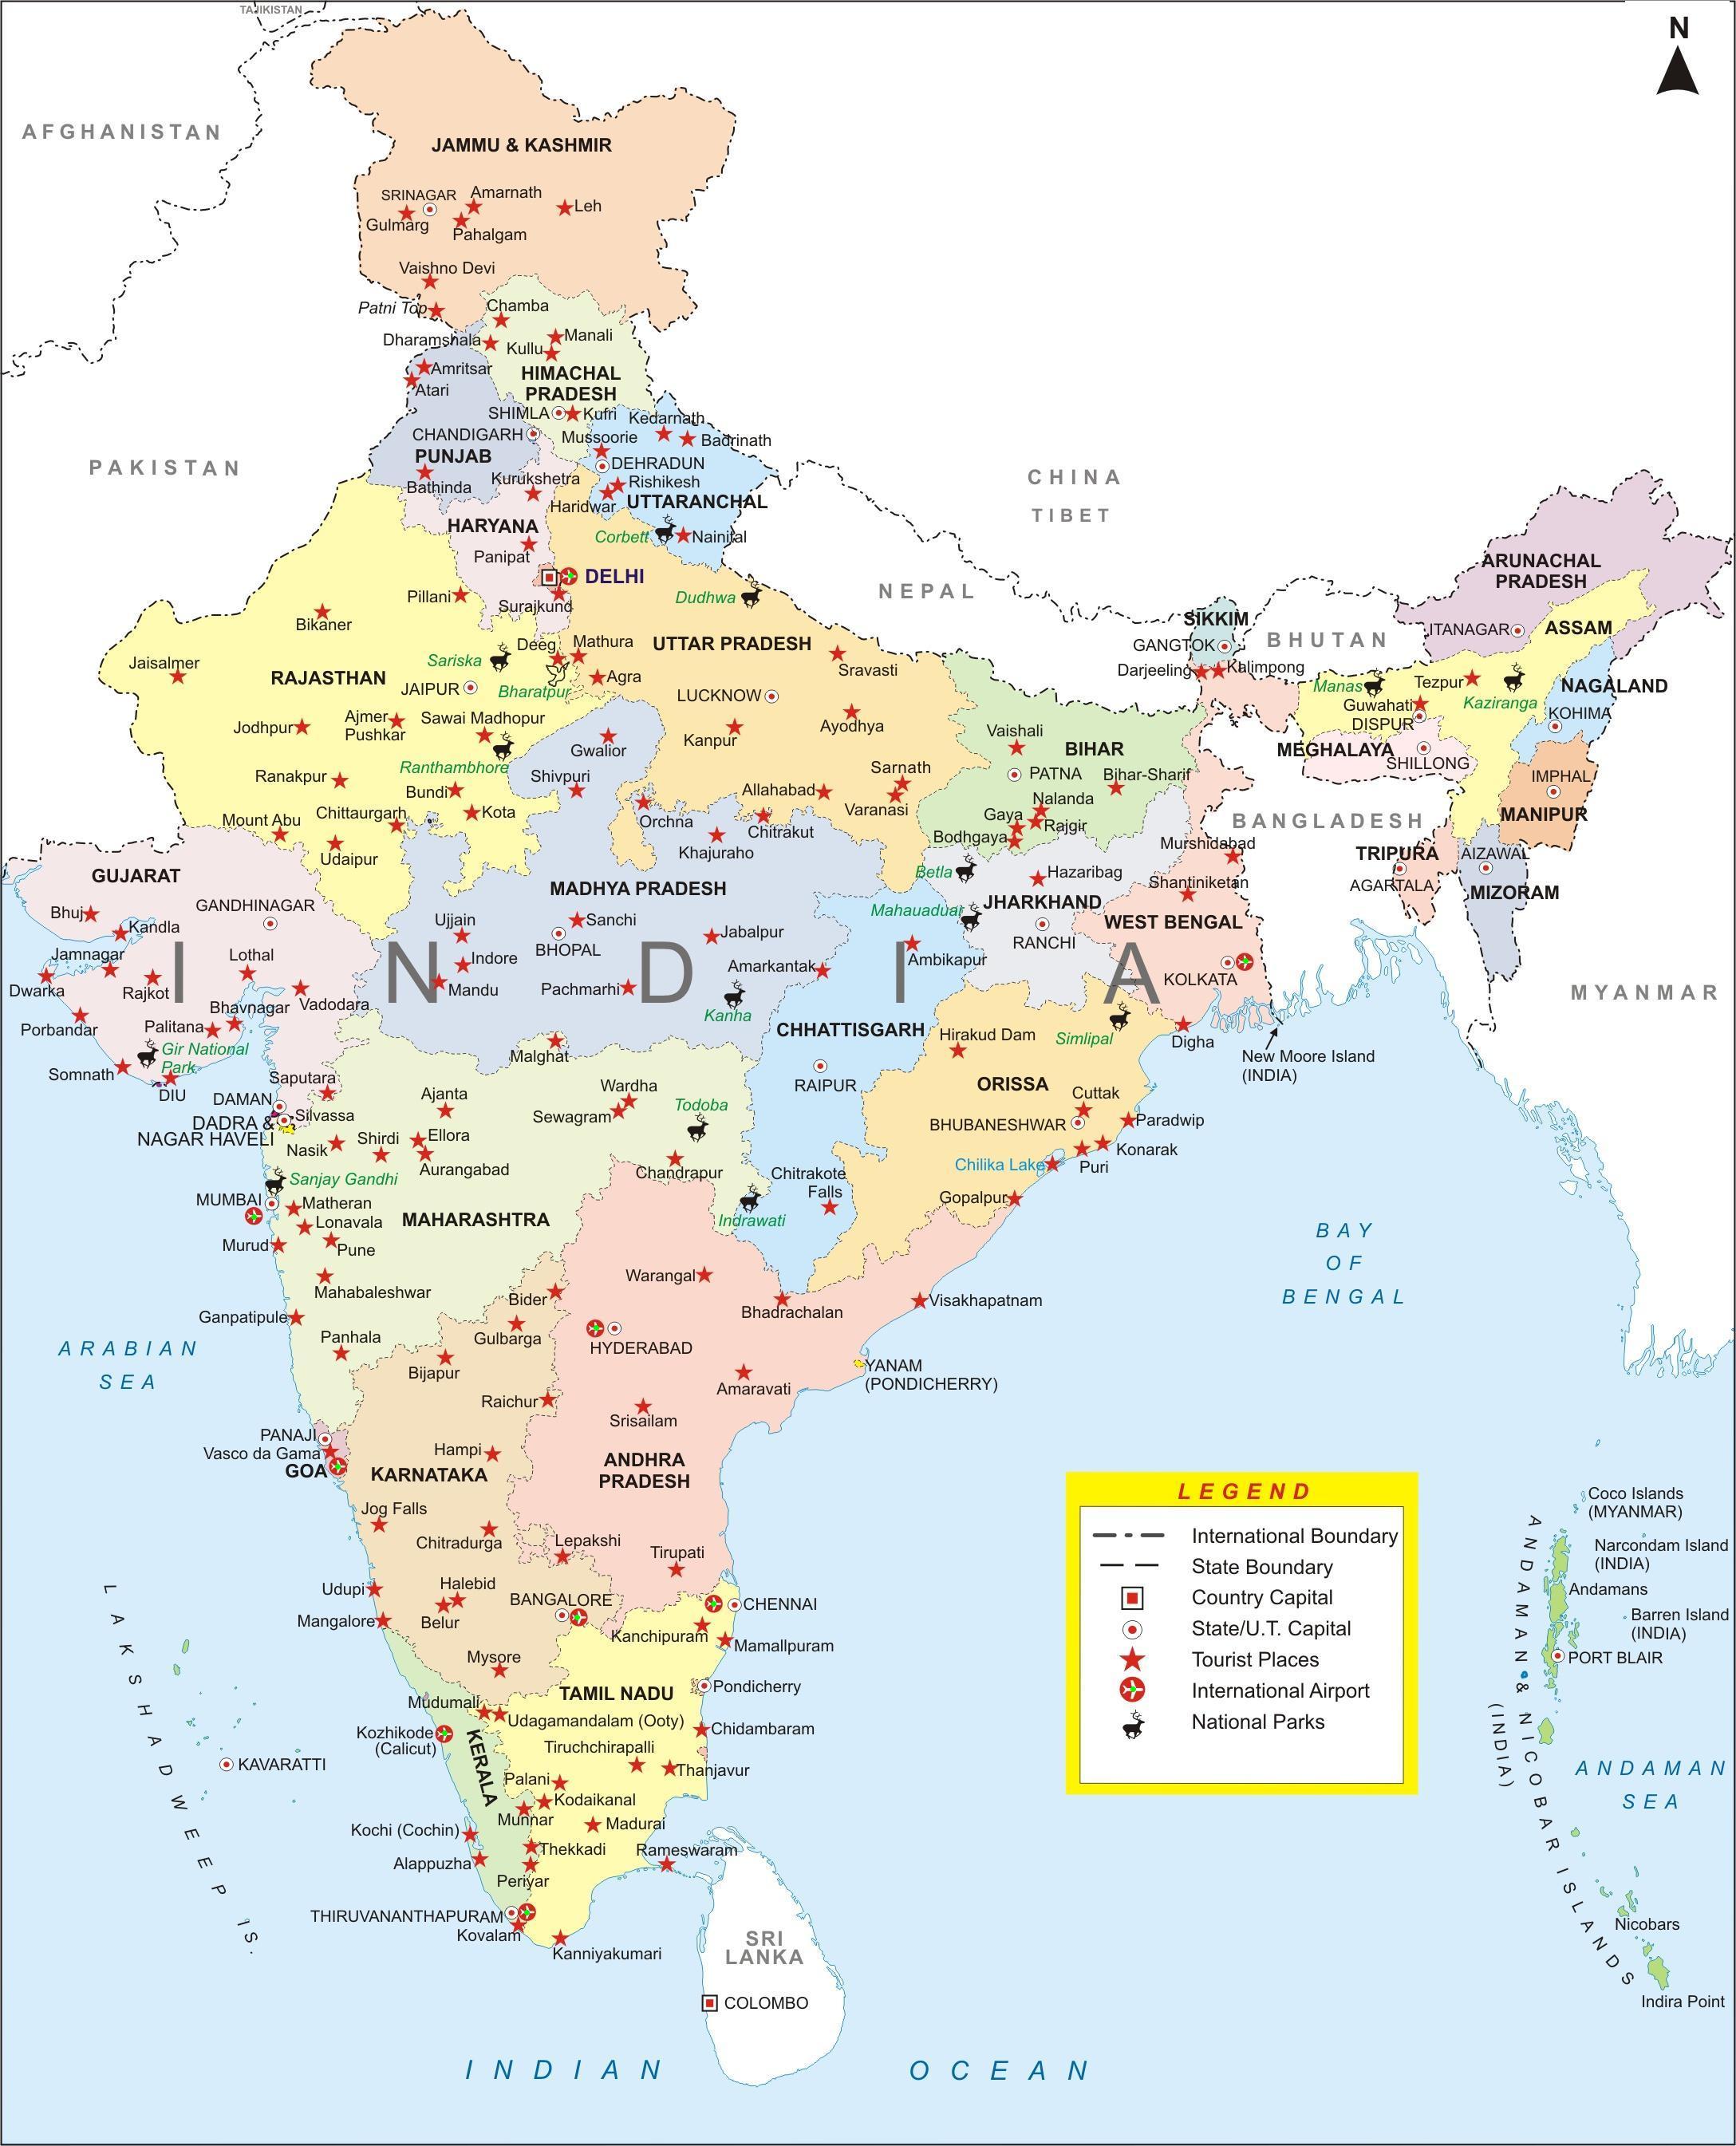 Image   India city map. | The Big Bang Theory Wiki | FANDOM